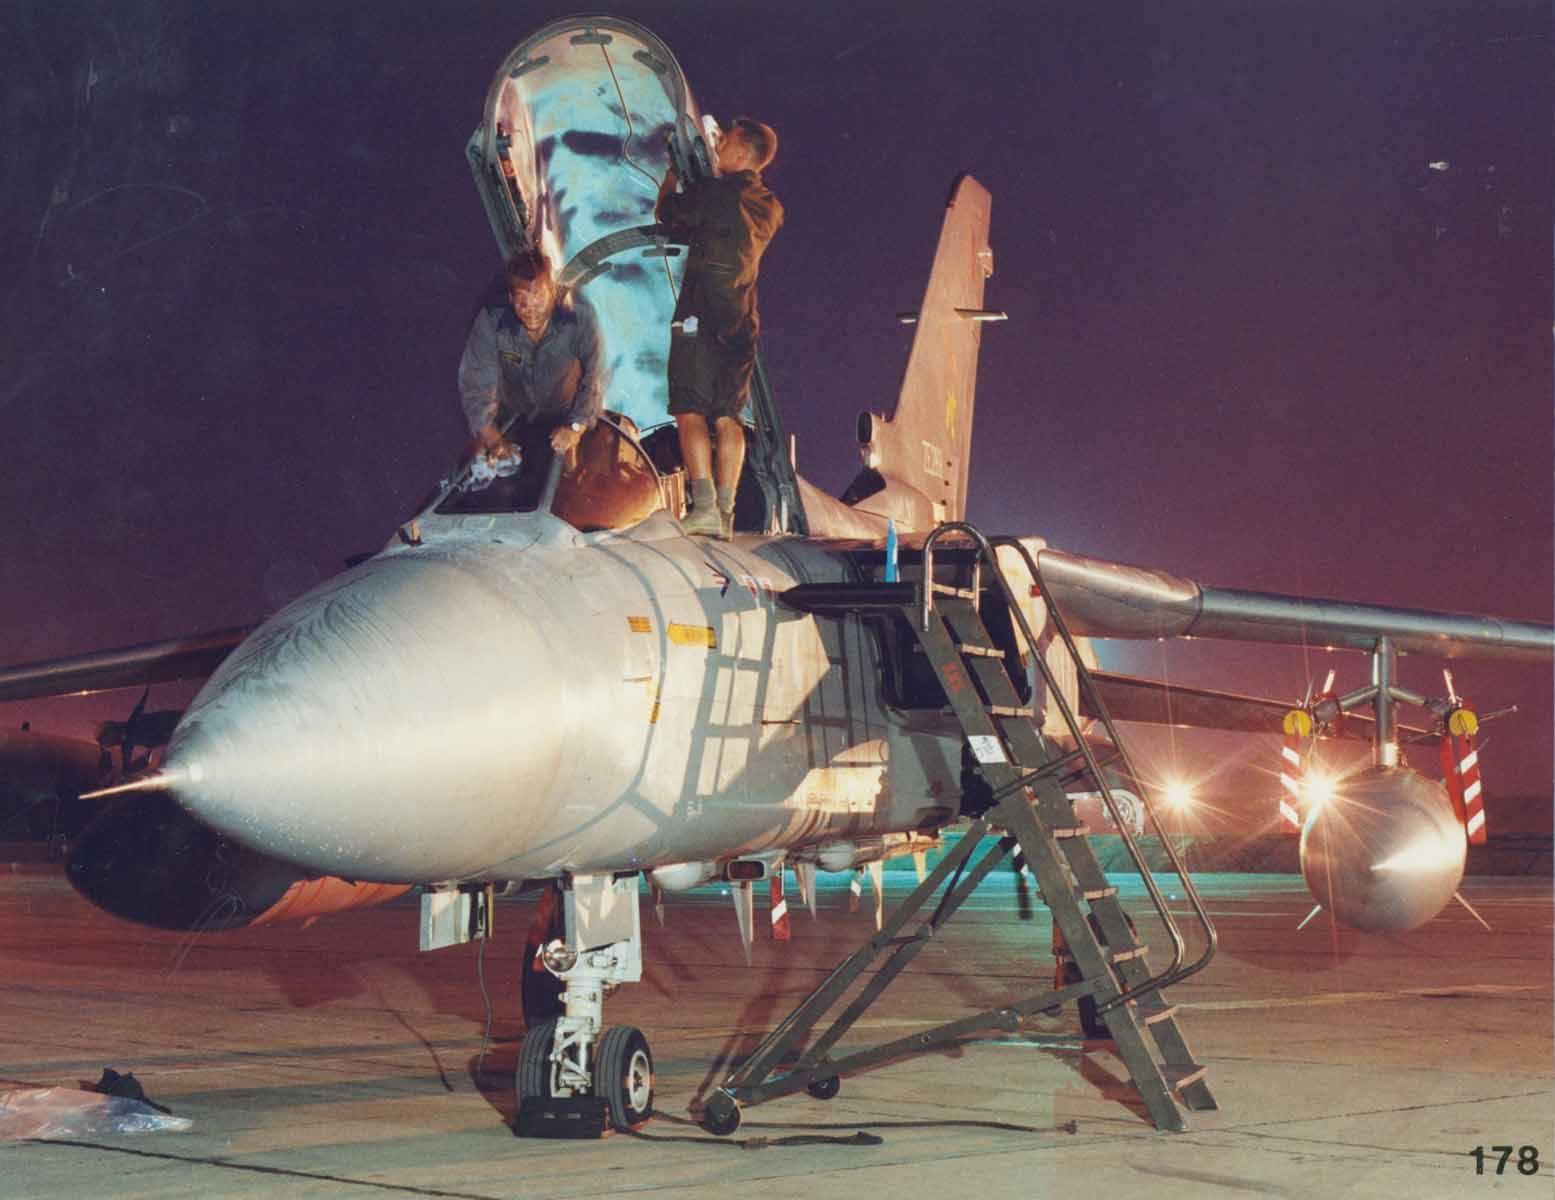 A Panavia Tornado F3, ZE289, at RAF Akrotiri during